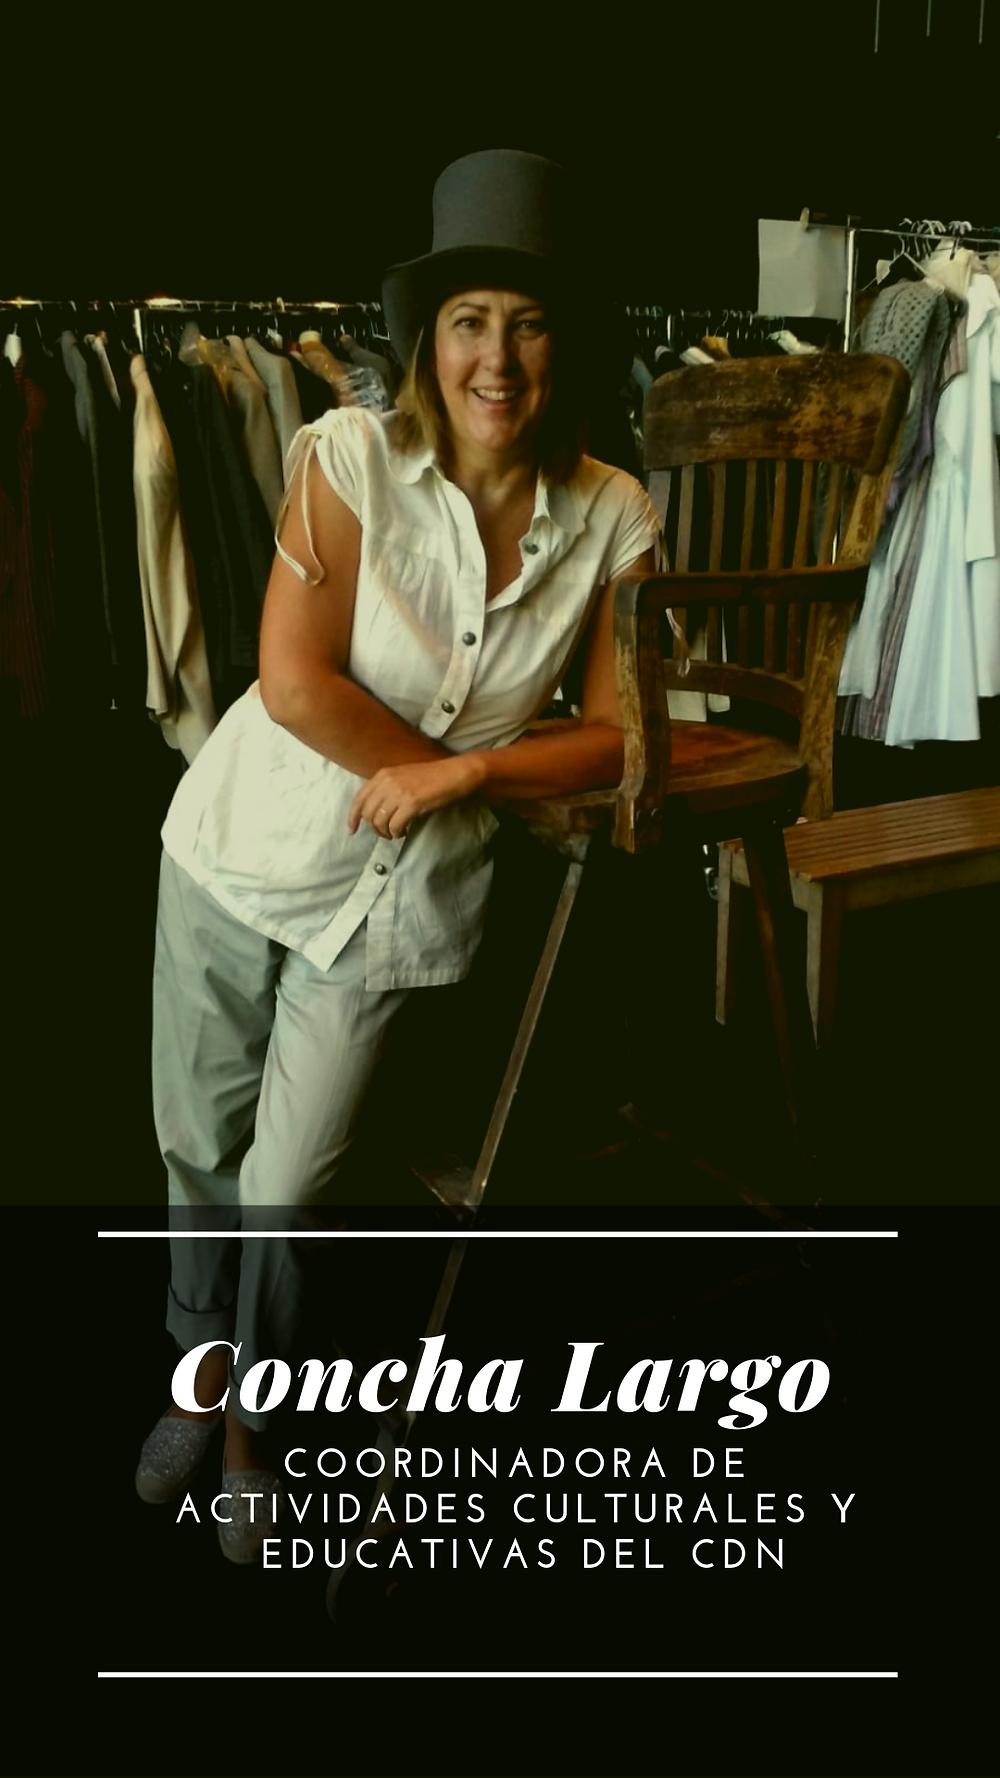 https://www.trincheracultural.com/post/entrevista-a-concha-largo-coordinadora-de-actividades-culturales-y-educativas-del-cdn